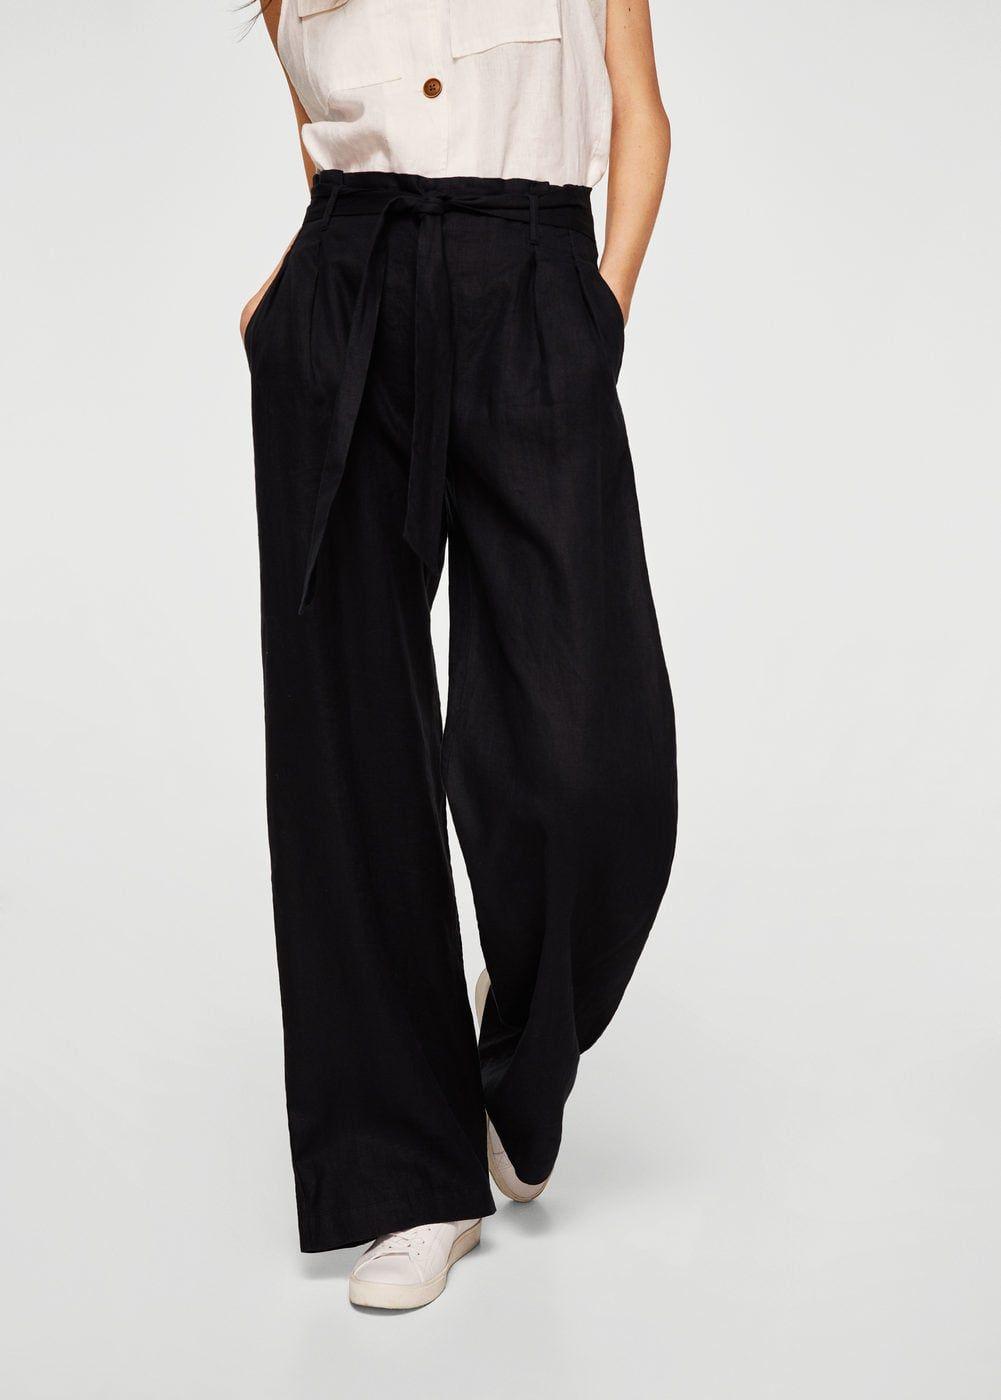 c66ca7b6b838 Pantalon en lin taille haute - Femme   Look   Pinterest   Pantalon ...